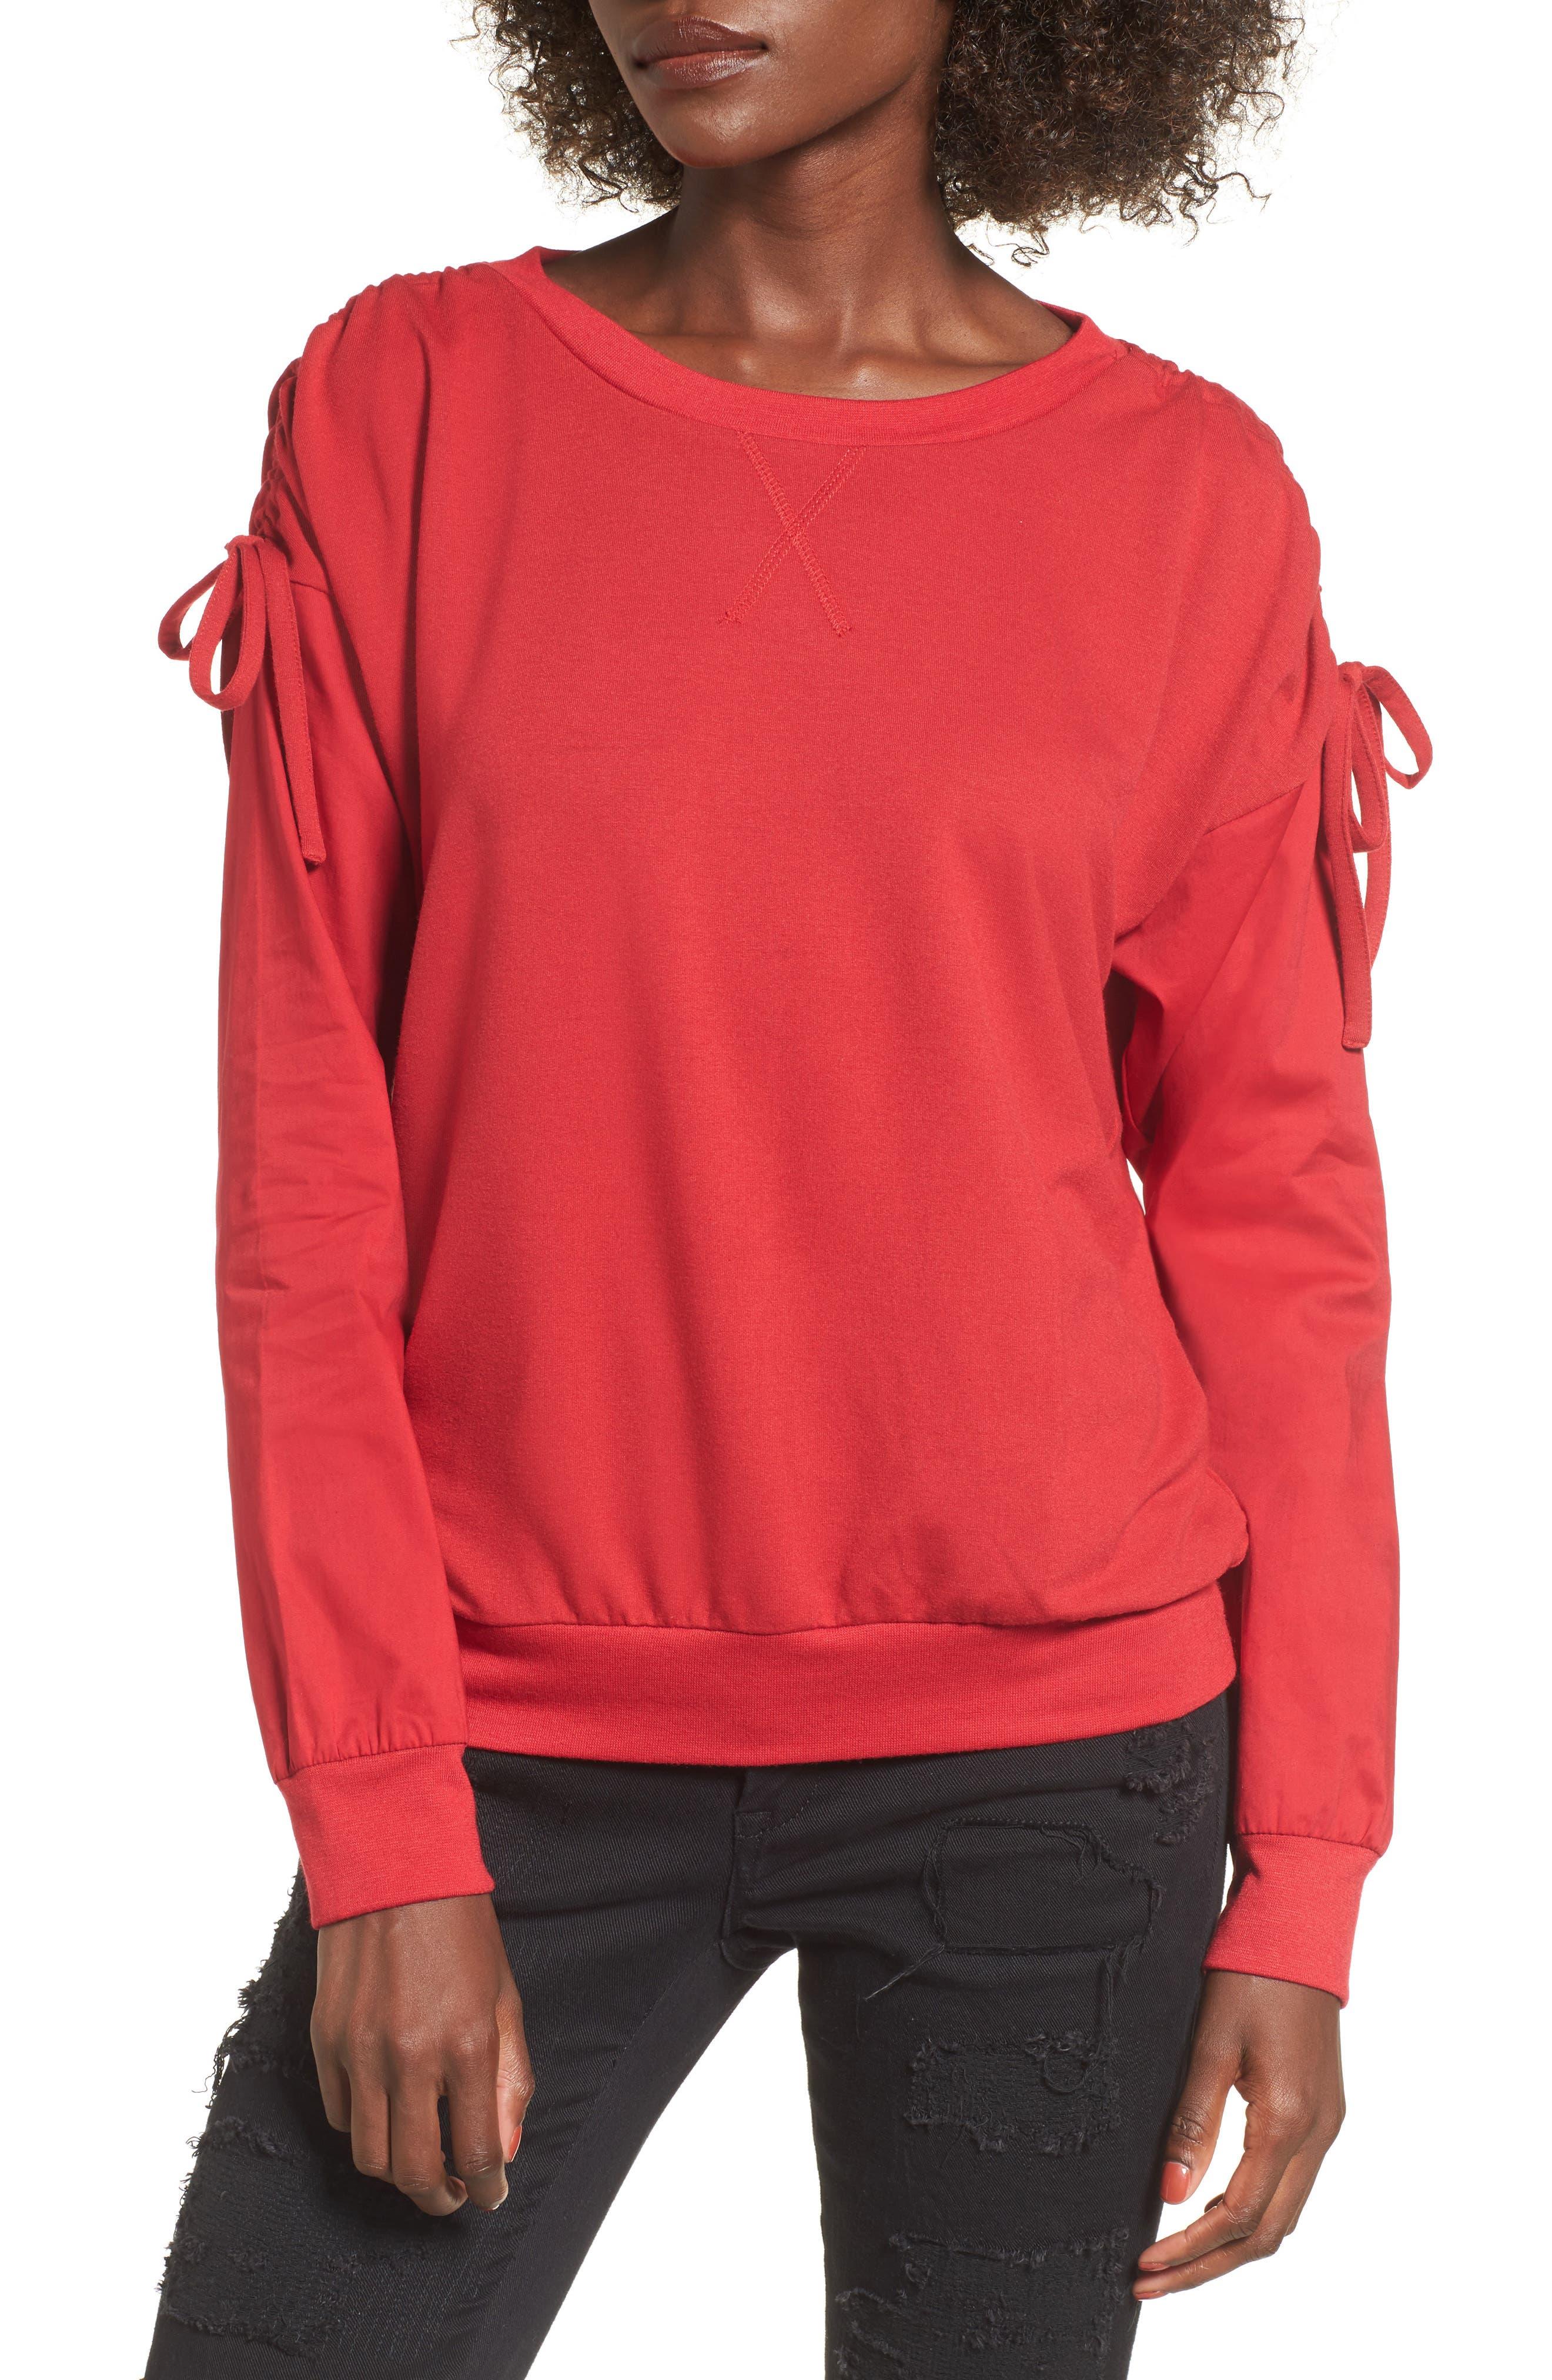 Cinch Sleeve Sweatshirt,                             Main thumbnail 1, color,                             603